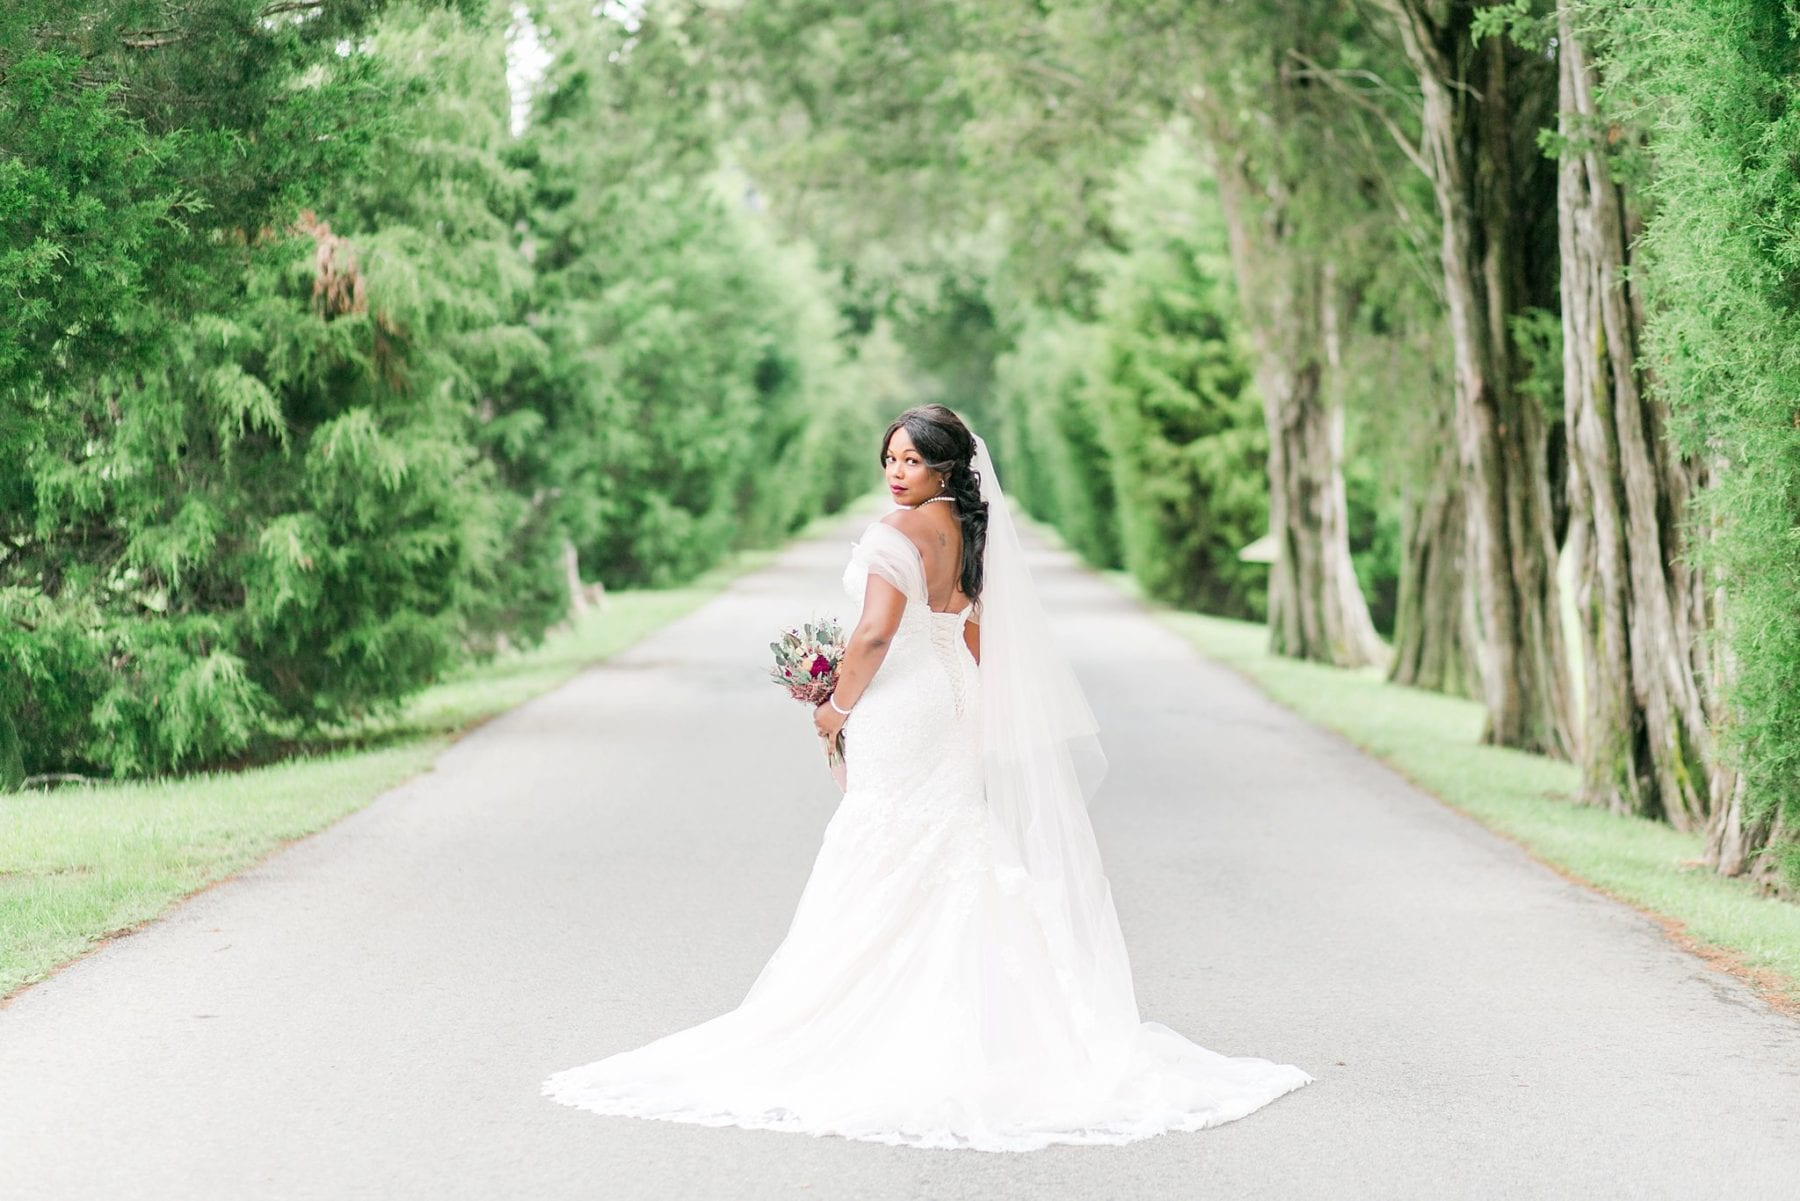 Jefferson Patterson Park Wedding Maryland Wedding Photographer Megan Kelsey Photography Jasmine & Seyi-62.jpg